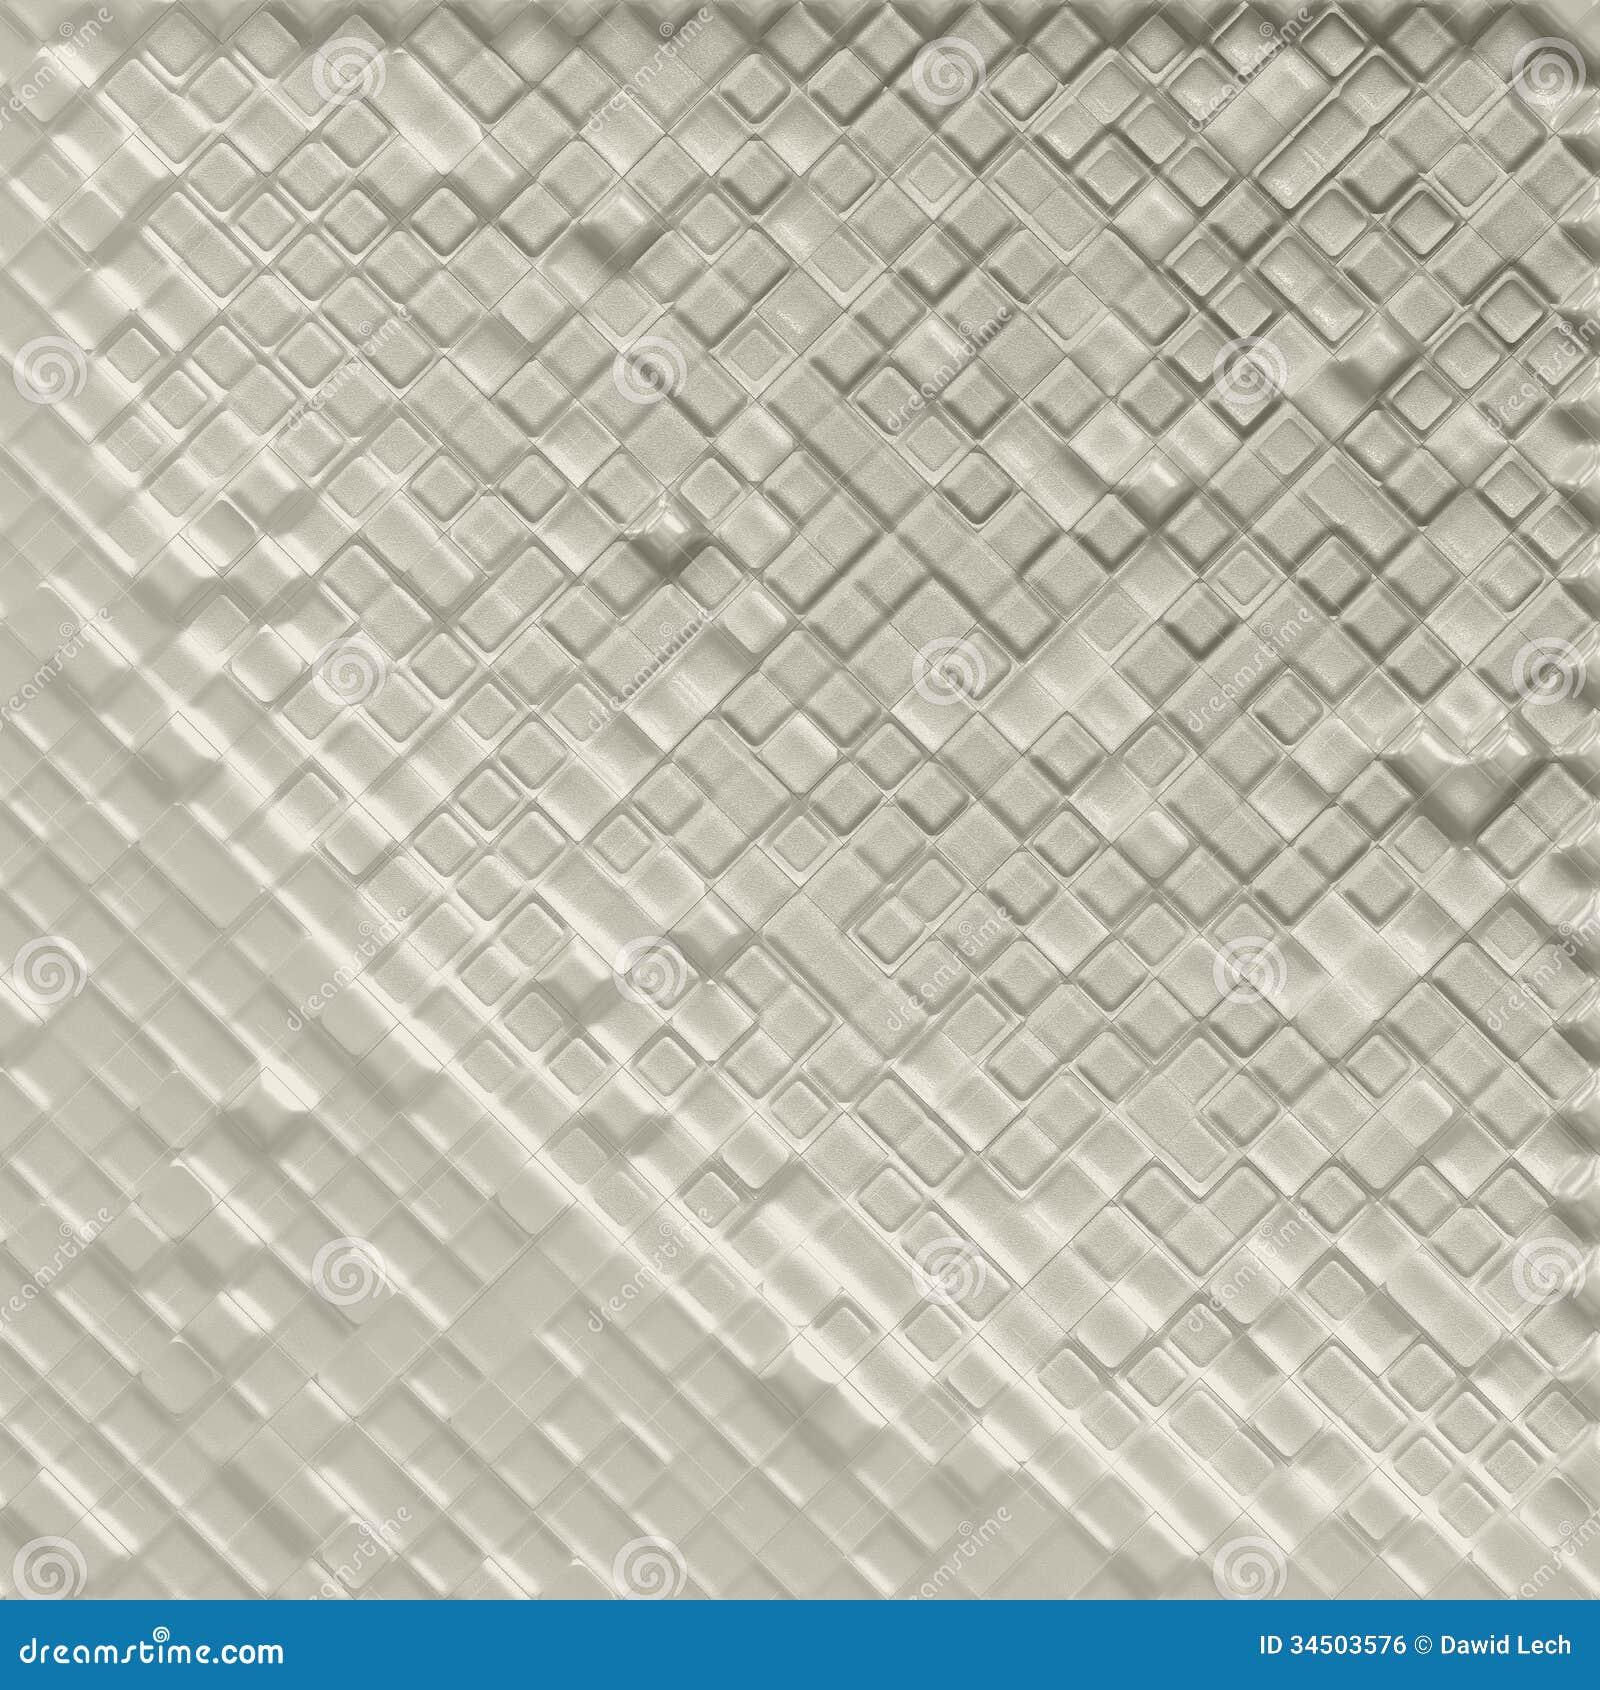 Platinum Tiles Background Royalty Free Stock Image